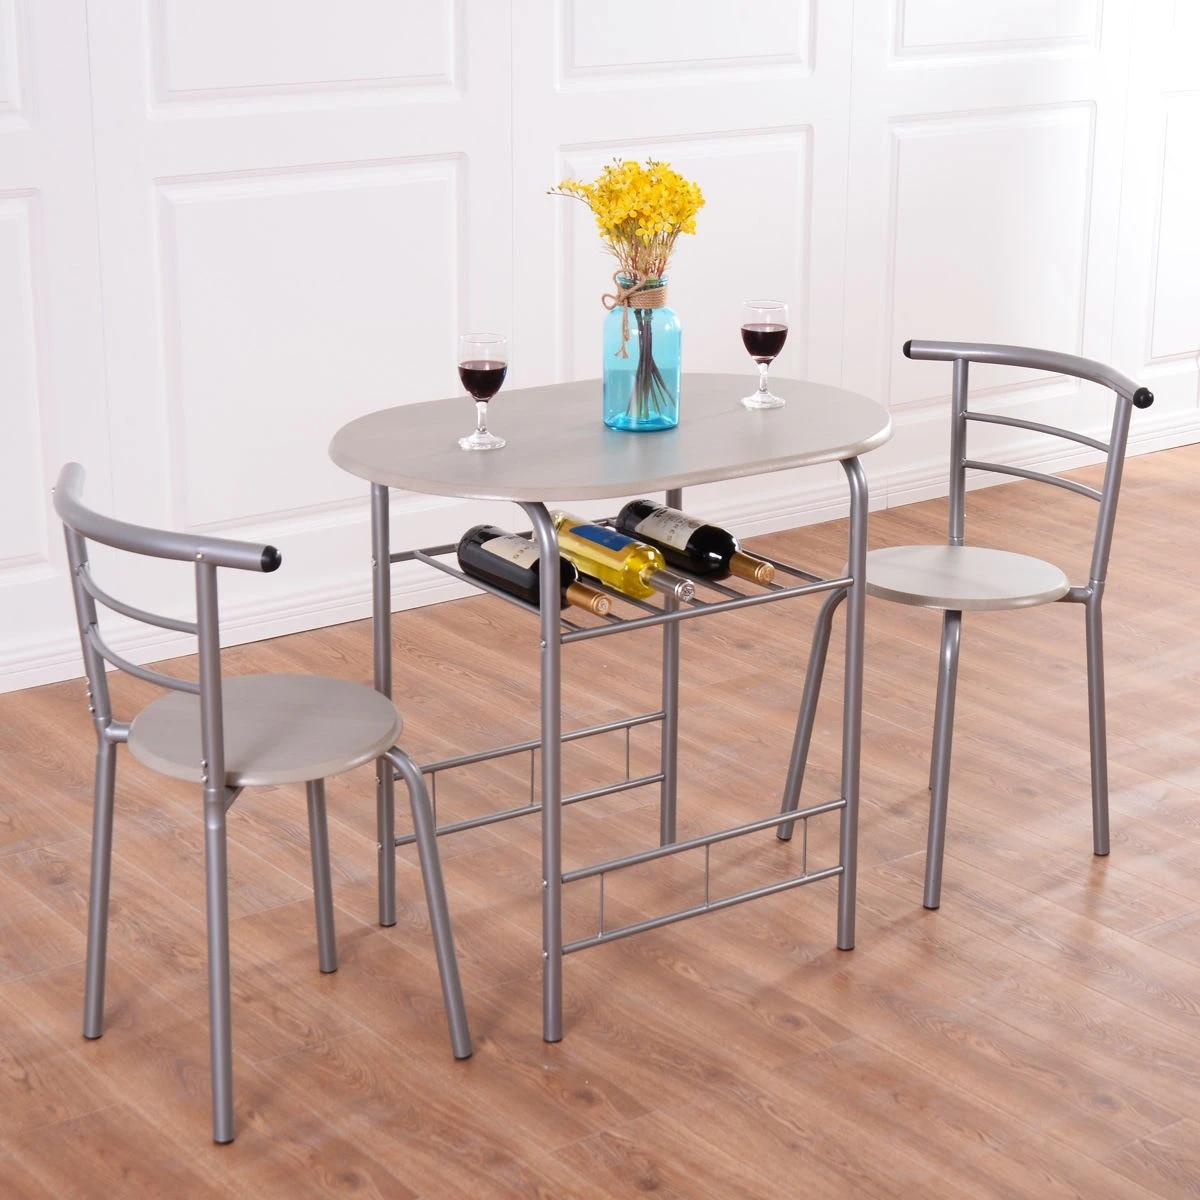 Costway 9 Piece Dining Set Table 9 Chairs Bistro Pub Home Kitchen Breakfast  Furniture